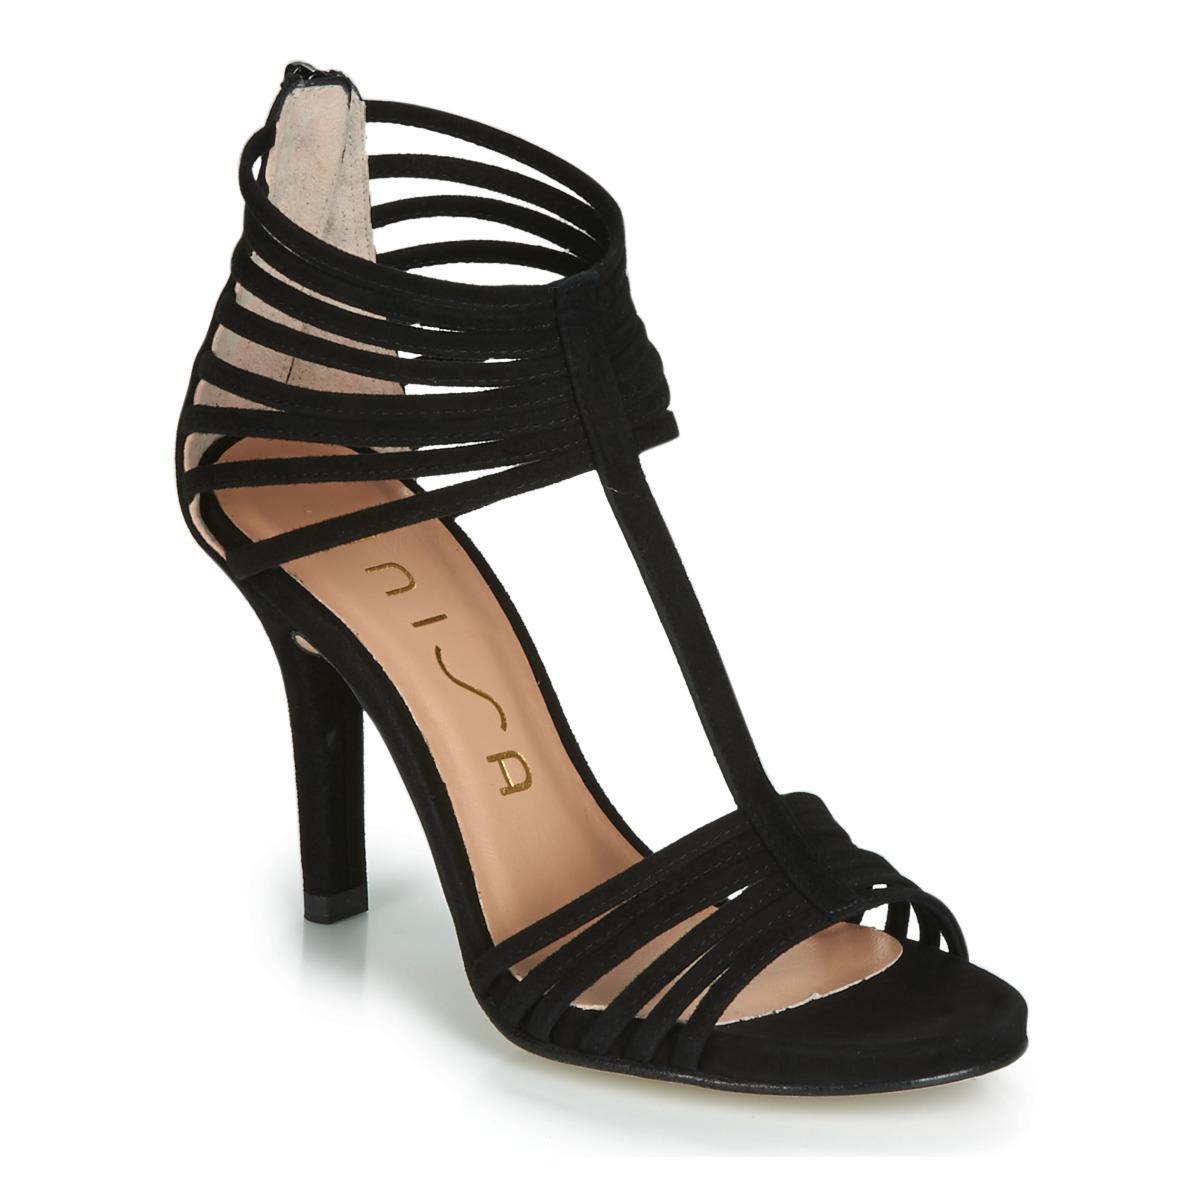 ca949c7c499a Unisa Yusta Court Shoes in Black - Lyst